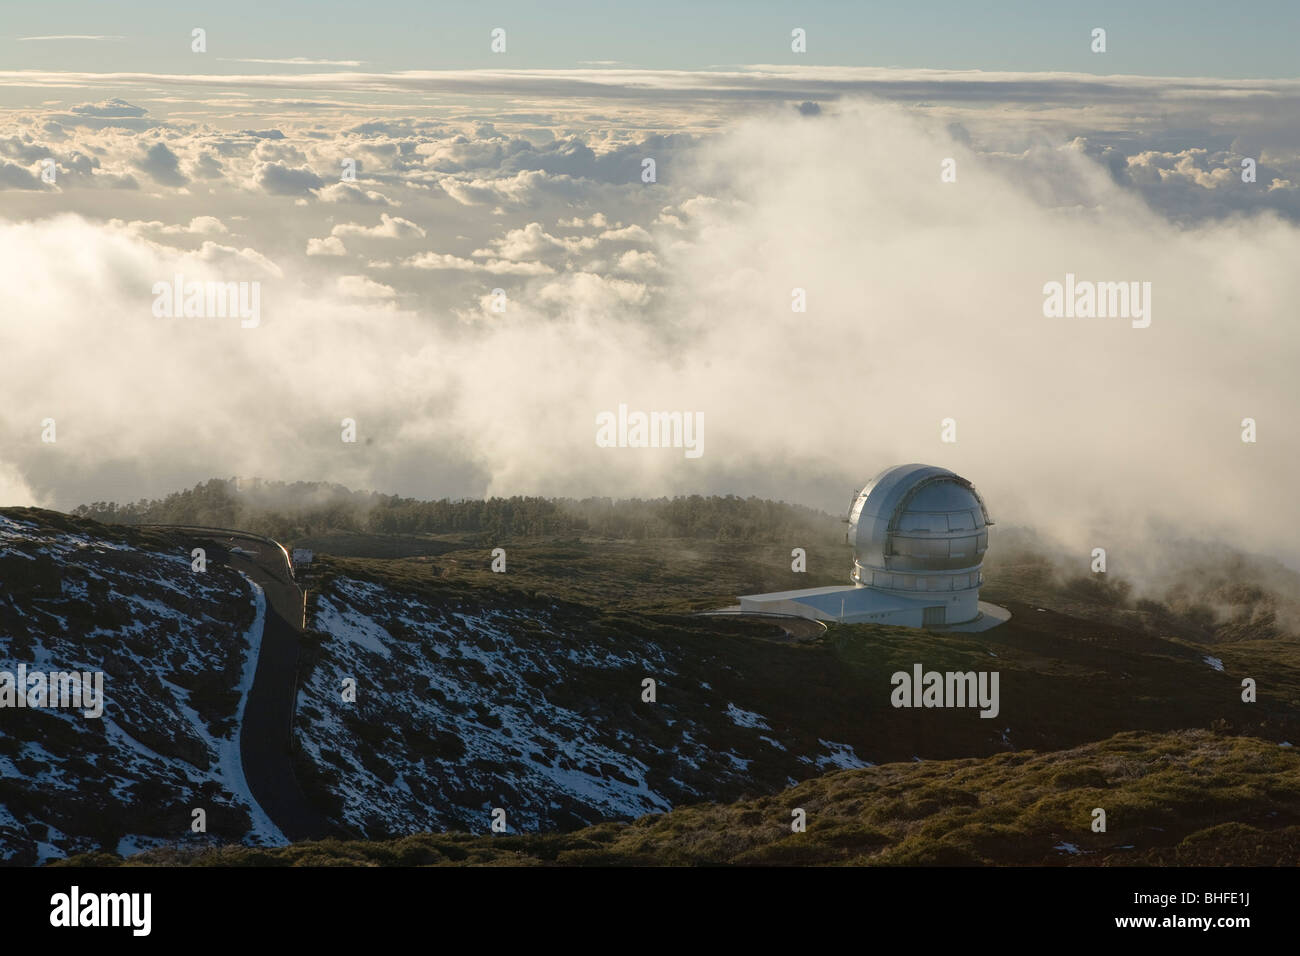 Gran Telescopio Canarias, GranTeCan, GTC, world's largest mirror telescope, Observatorio Astrofisico, astronomy, - Stock Image